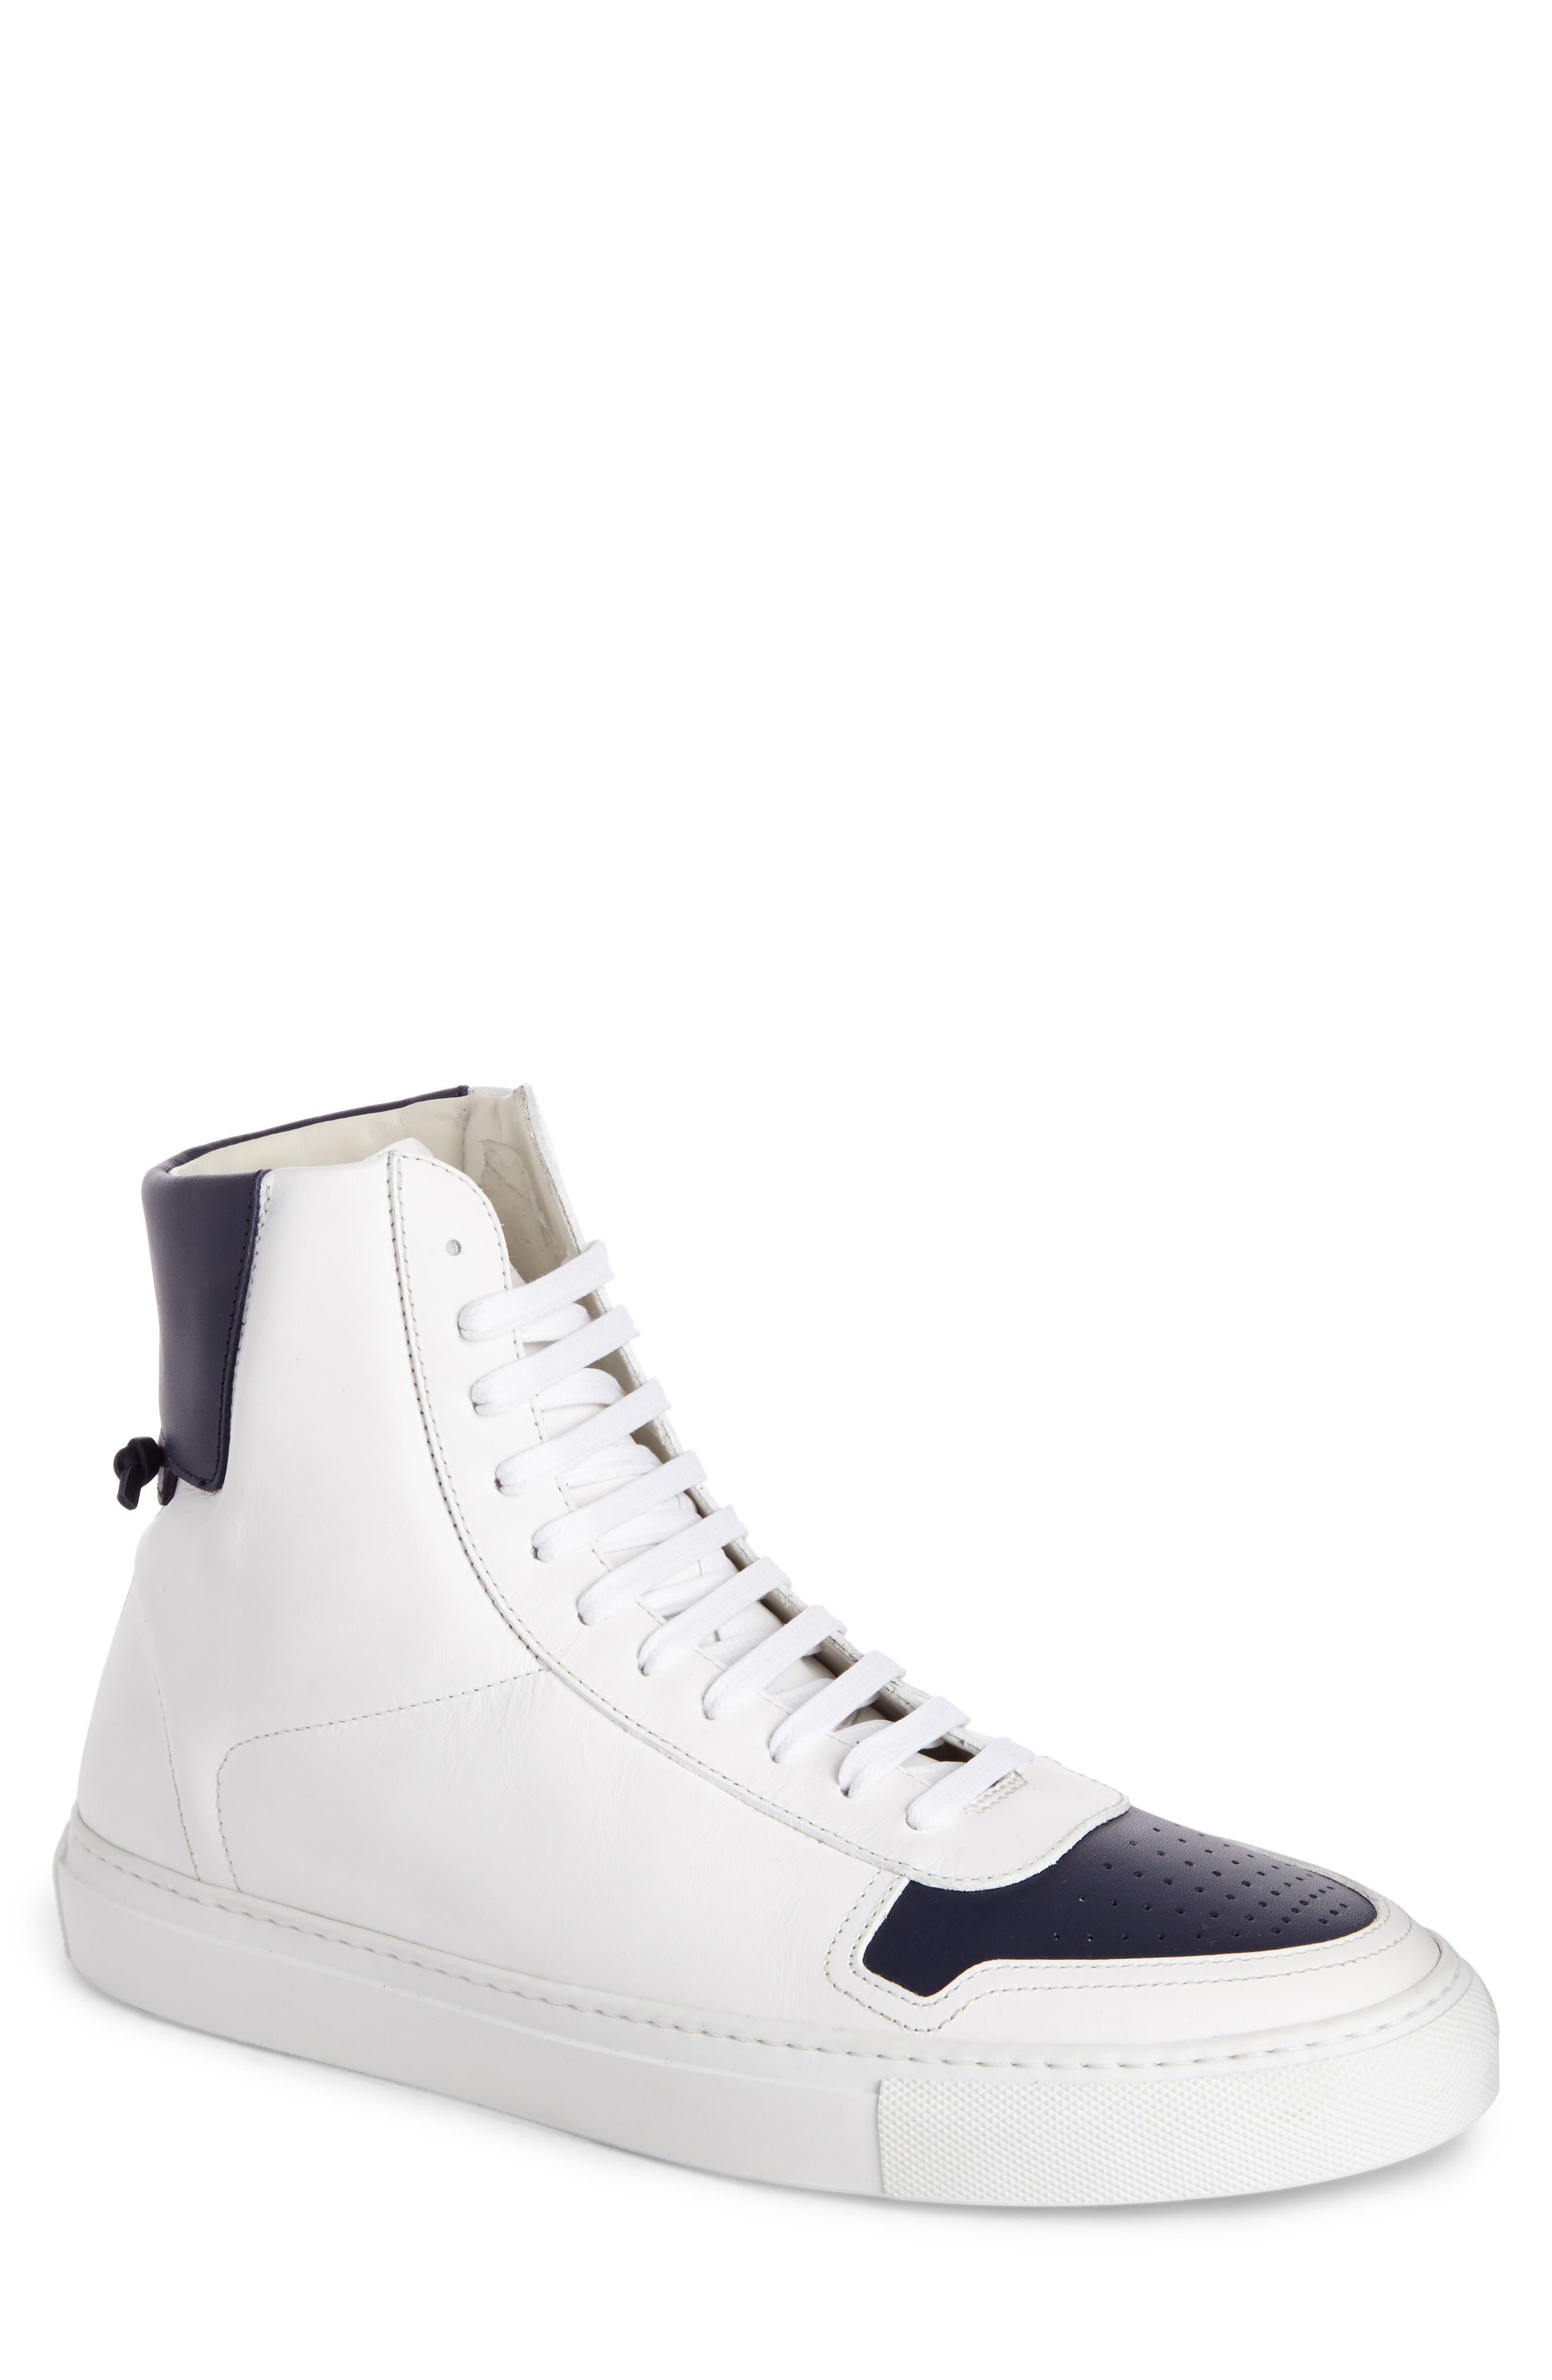 High Top Sneaker,                             Main thumbnail 1, color,                             131